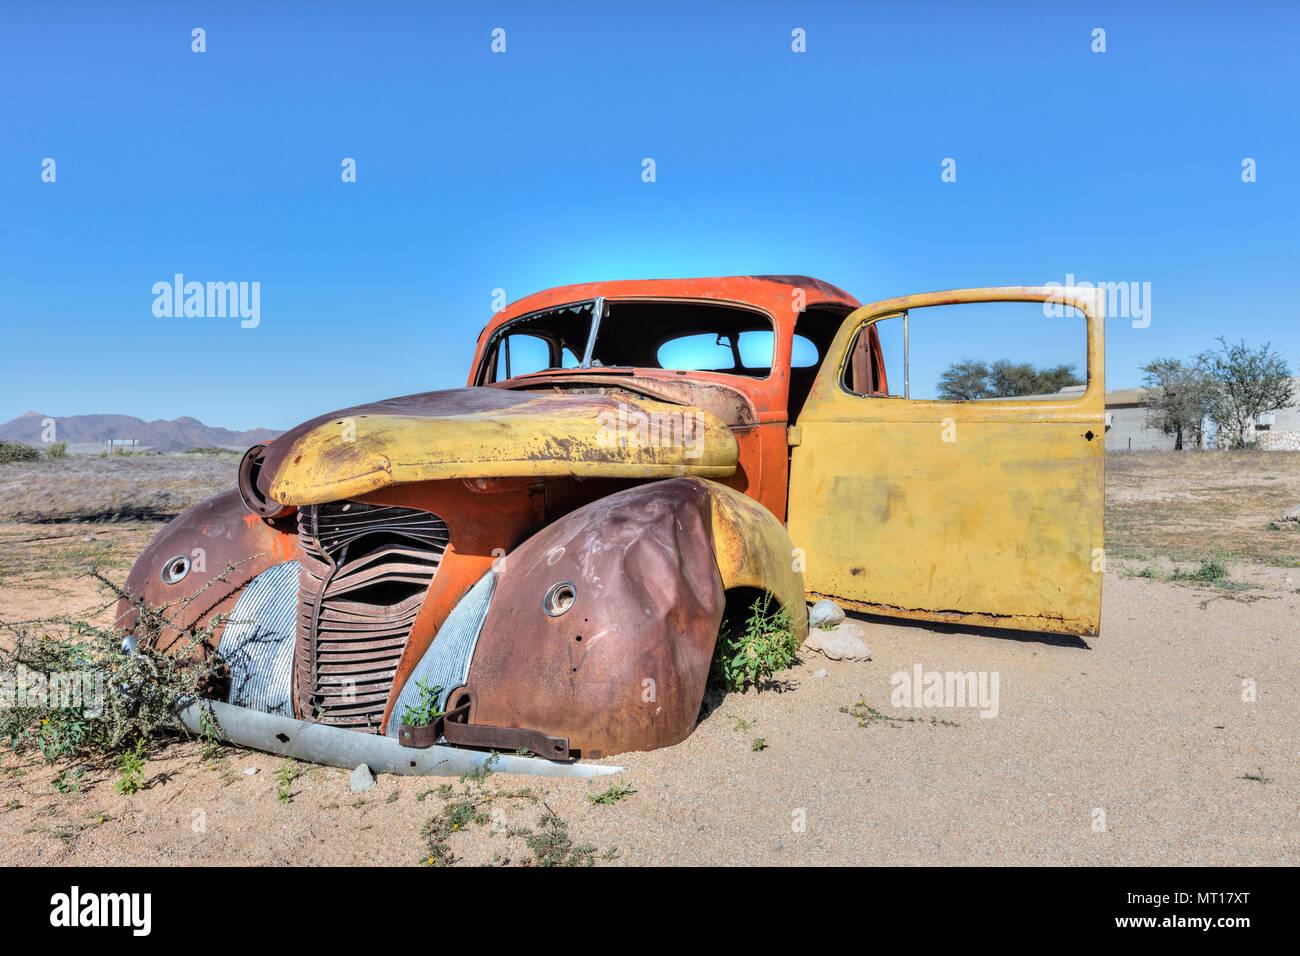 Solitaire, Khomas Region, Namib desert, Namibia, Africa - Stock Image